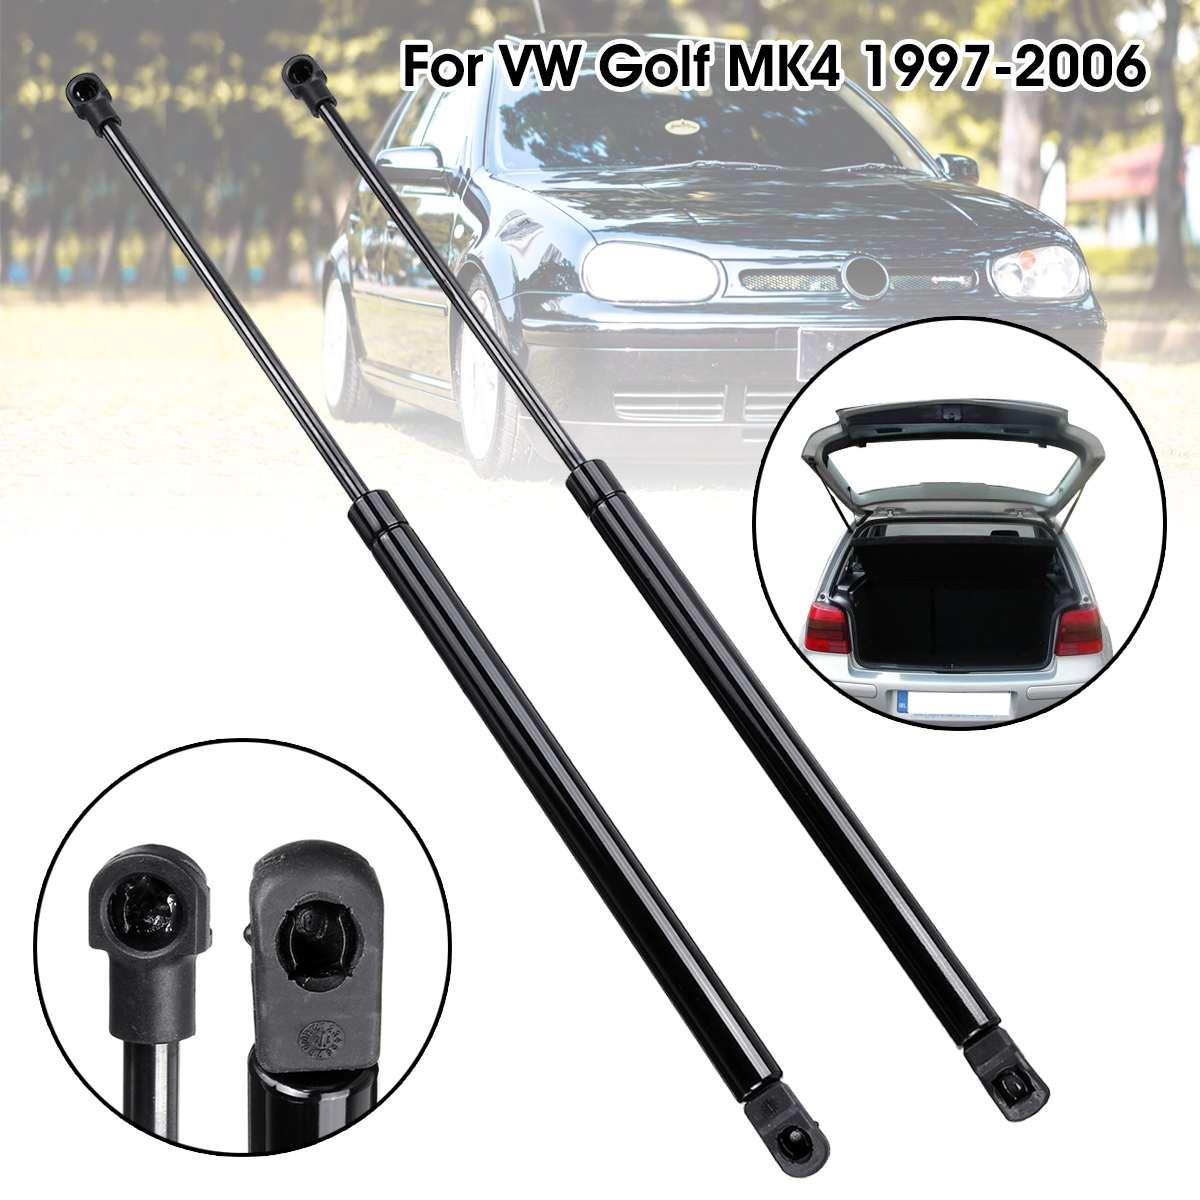 1 par de elevadores traseros para maletero, soportes de barra de Gas, amortiguadores de brazo, amortiguador de barras para VW Golf MK4 1997-2006 Estate 1J6827550